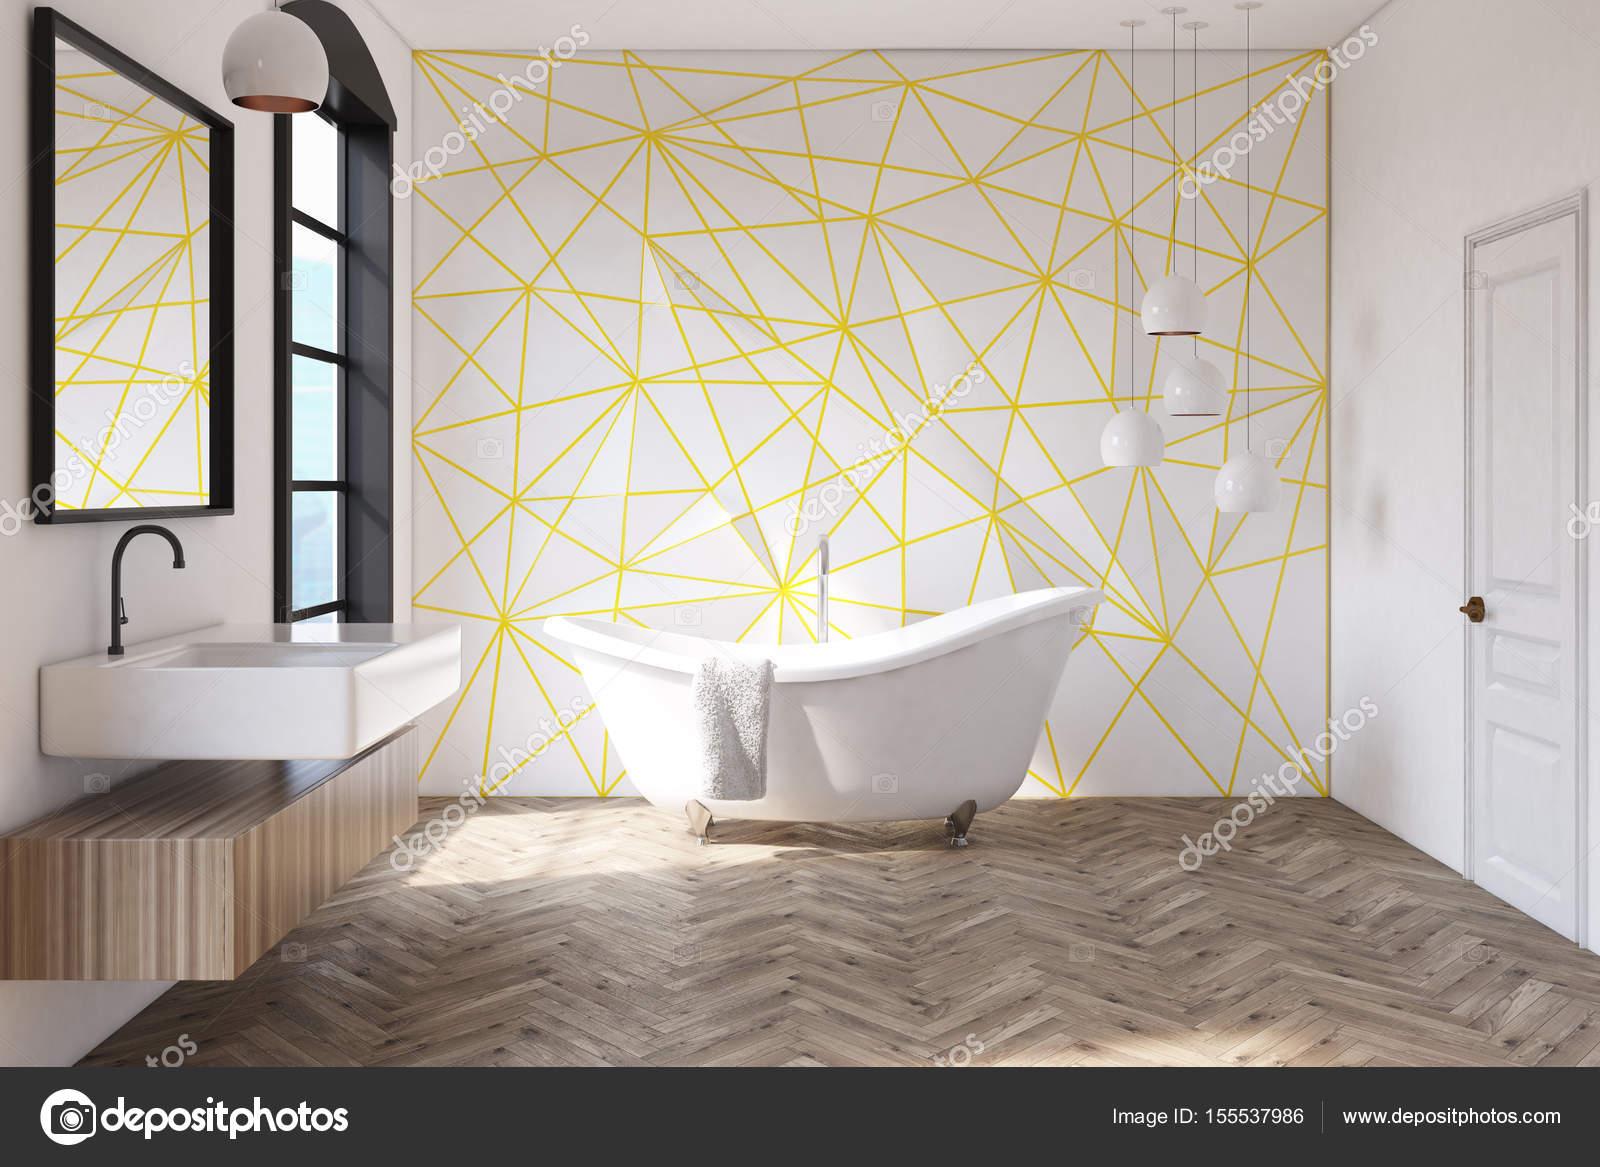 https://st3.depositphotos.com/2673929/15553/i/1600/depositphotos_155537986-stockafbeelding-witte-badkamer-geel-patroon-lampen.jpg